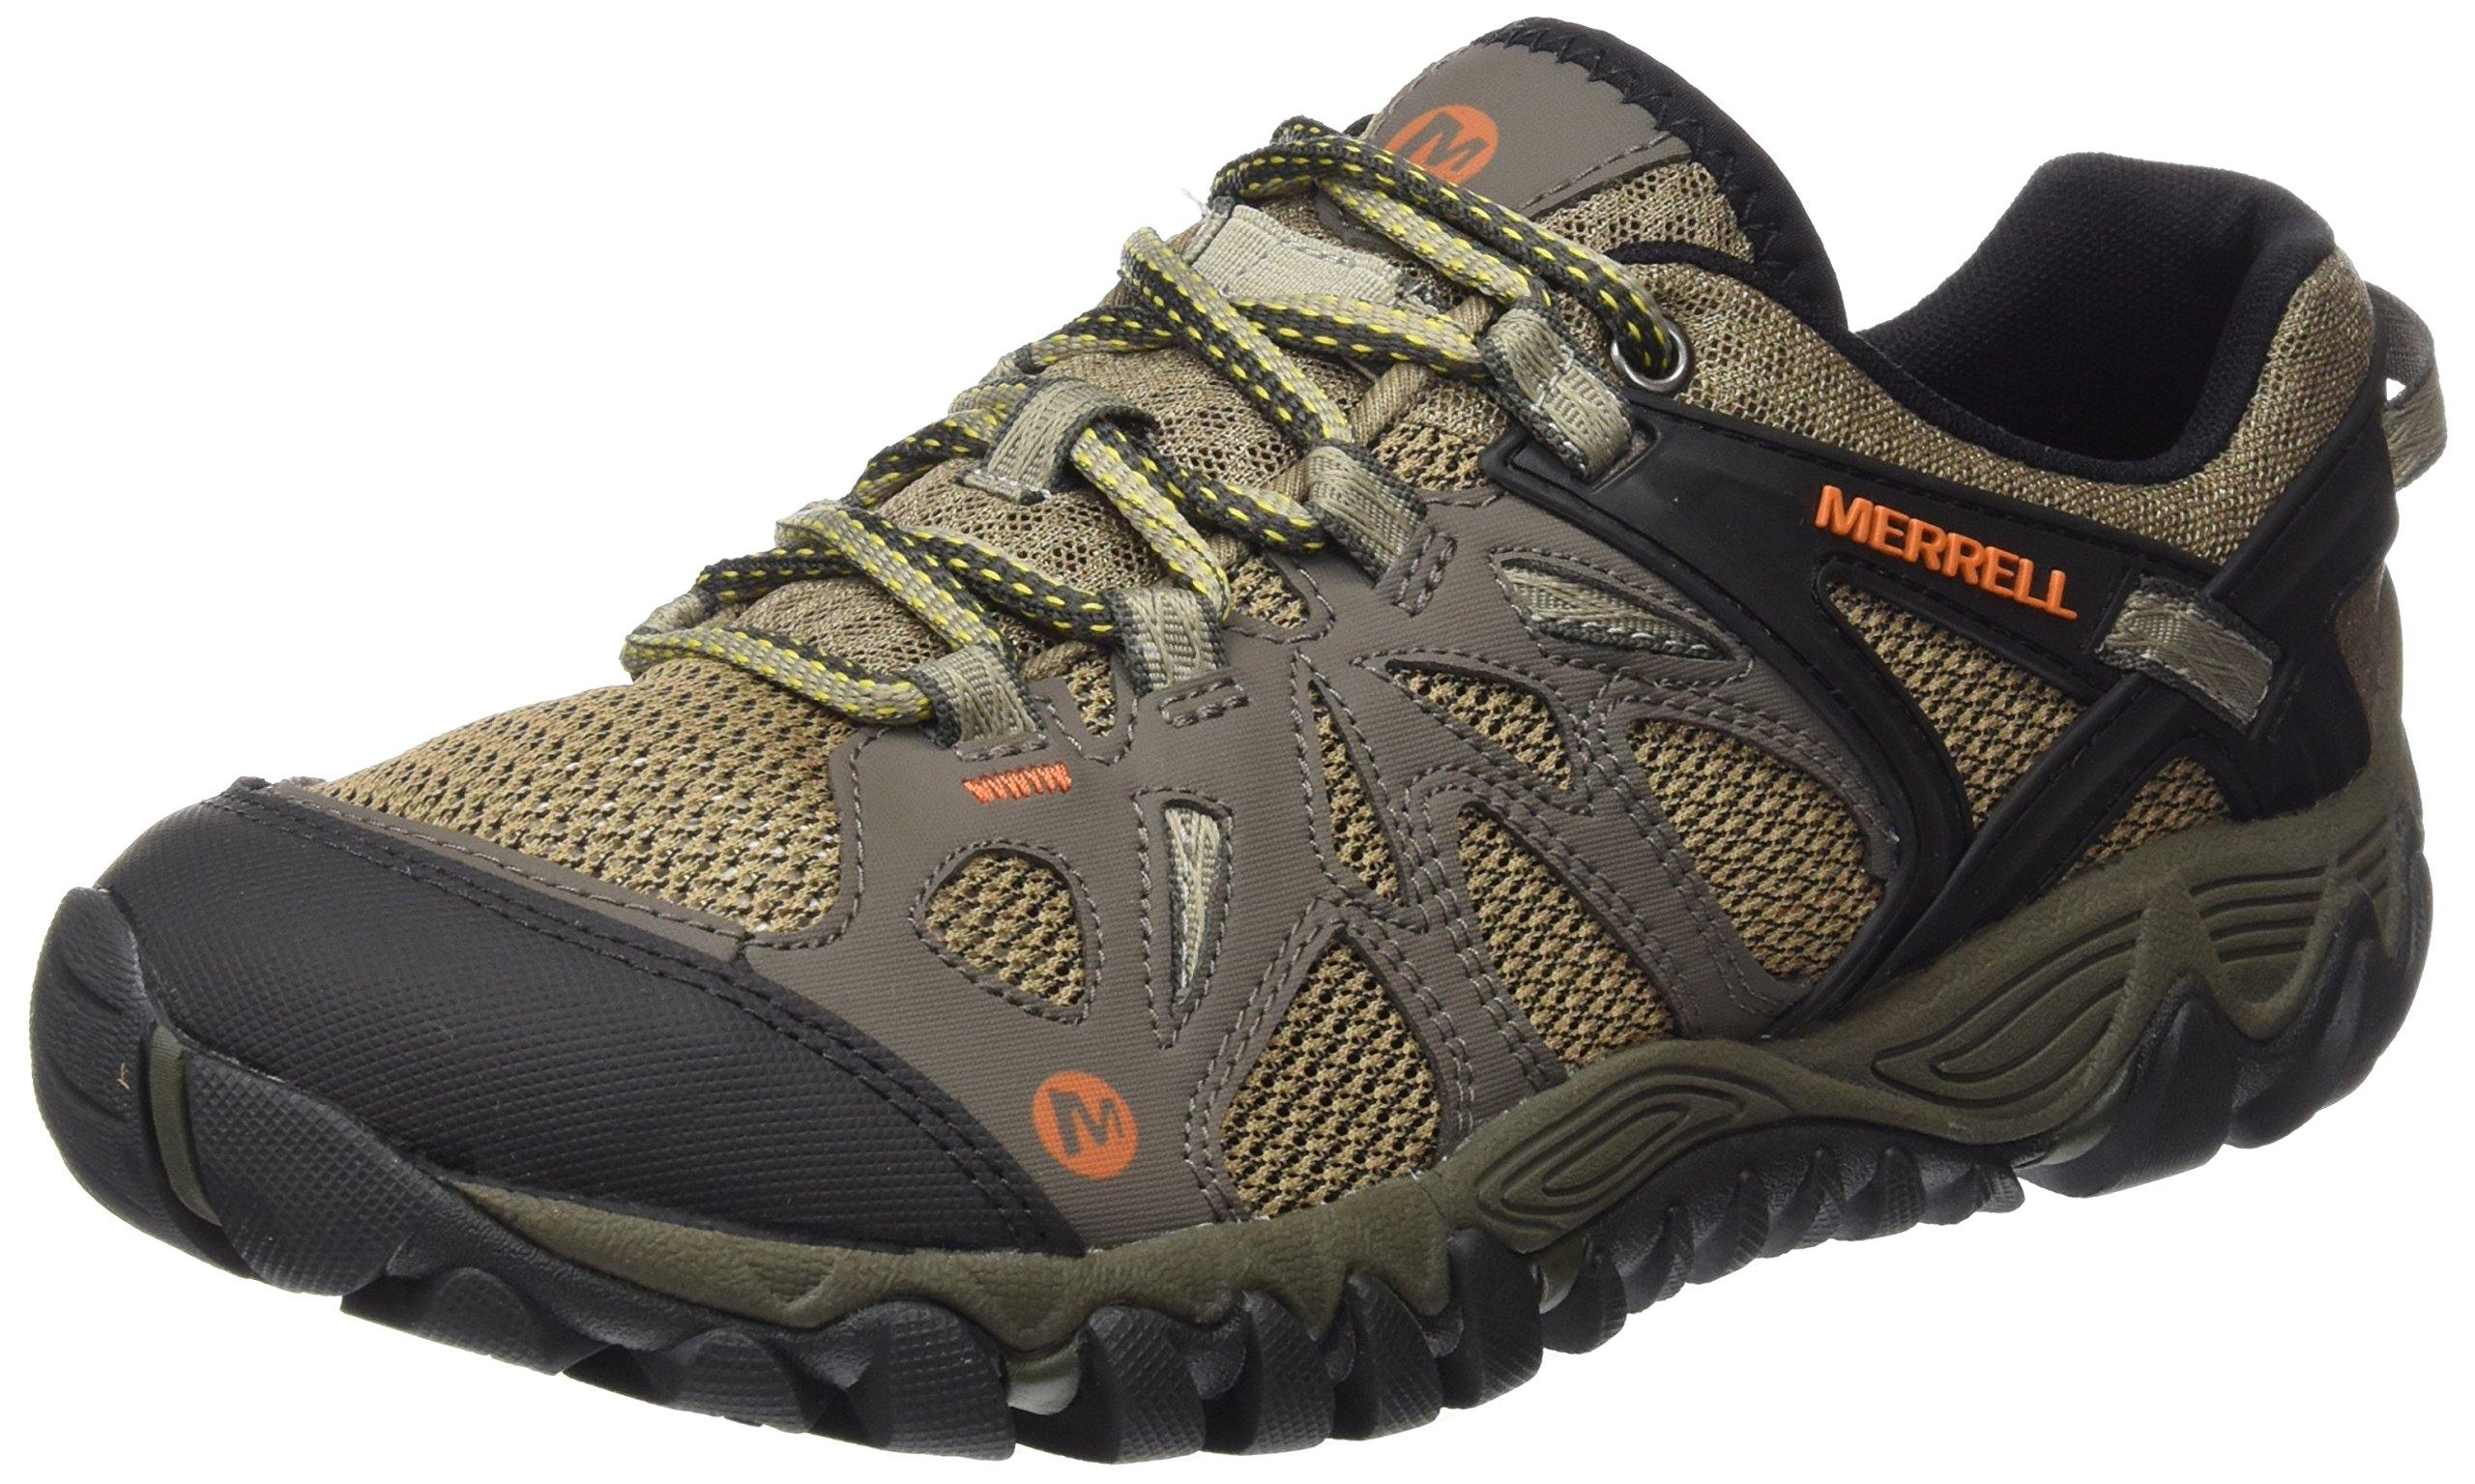 Merrell Men's All Out Blaze Aero Sport Hiking Water Shoe, Khaki, 7 M US by Merrell (Image #1)